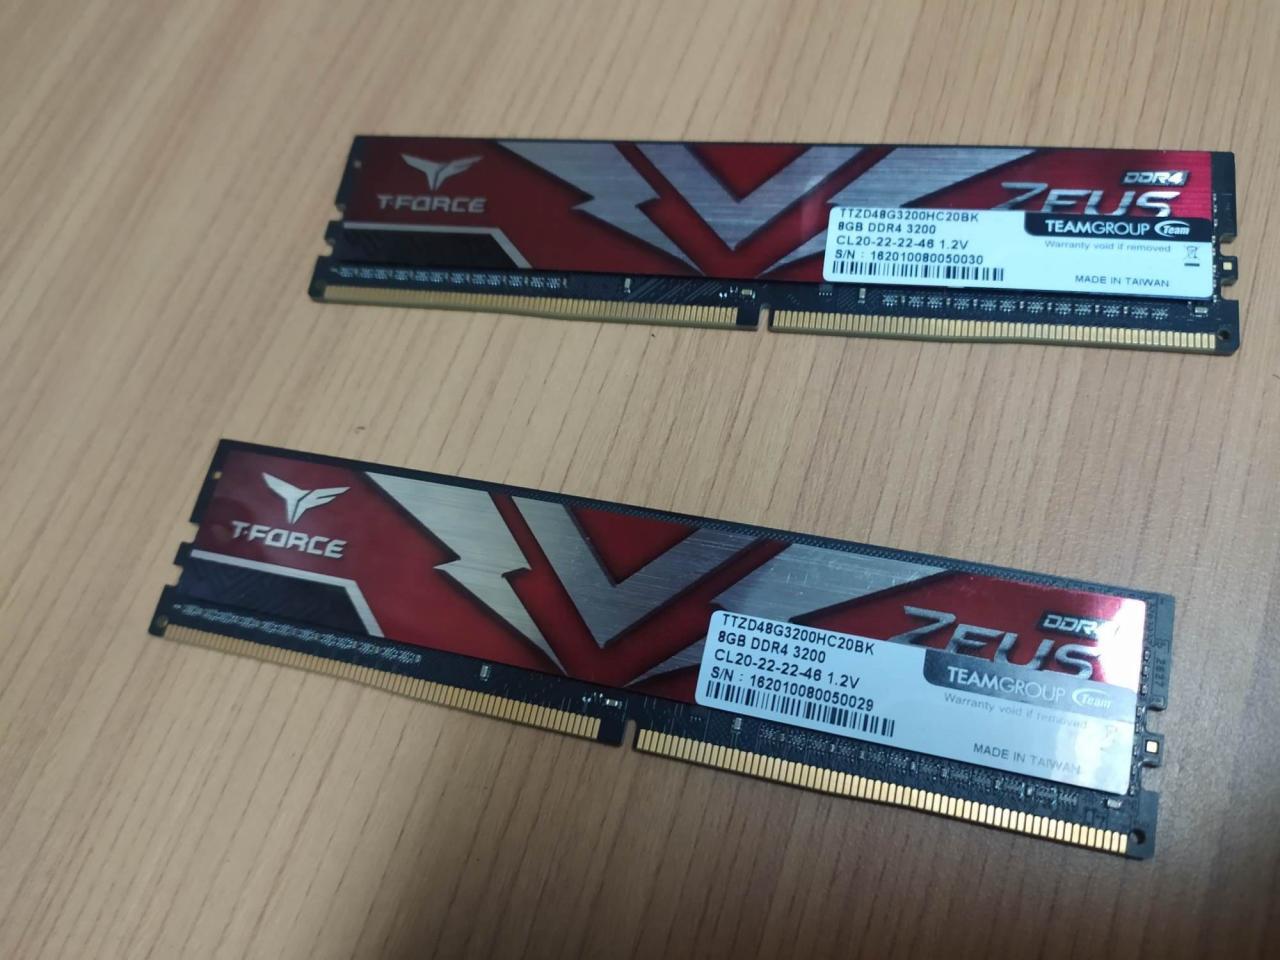 T-Force Zeus DDR4 16GB